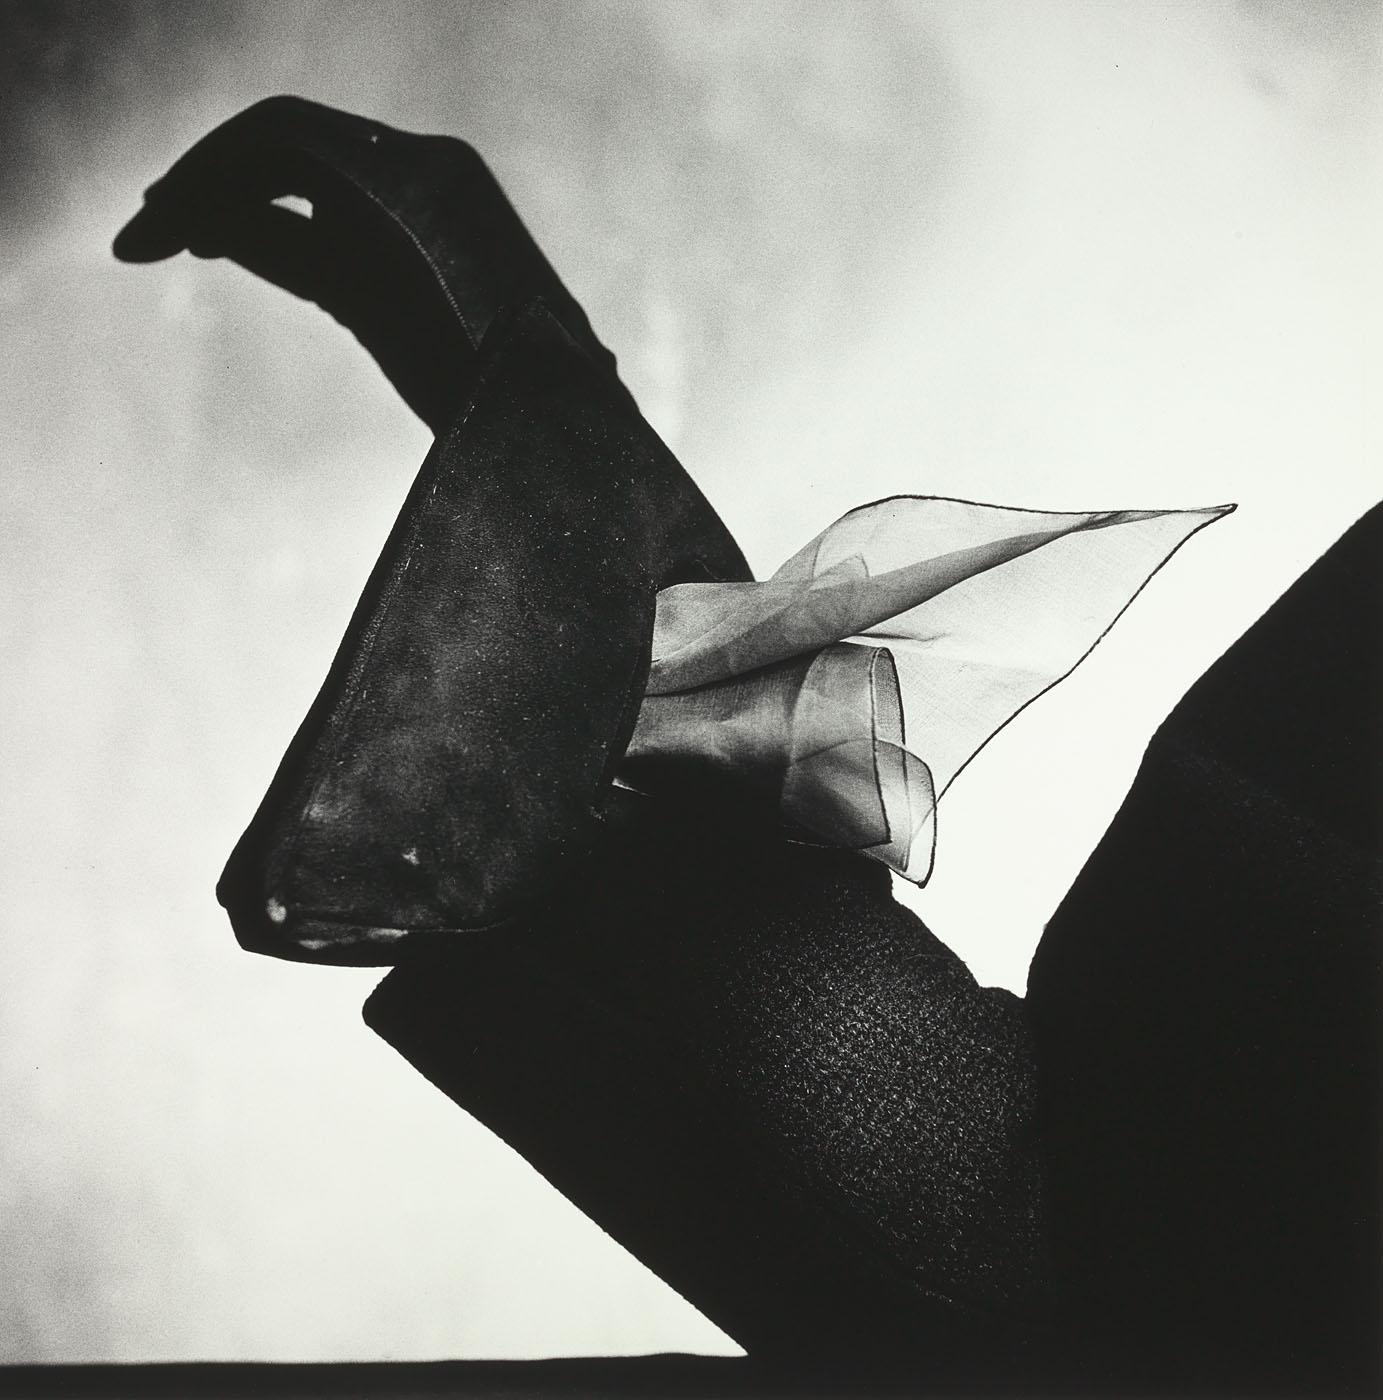 02_Kerchief Glove (Dior), Paris, 1950.jpg